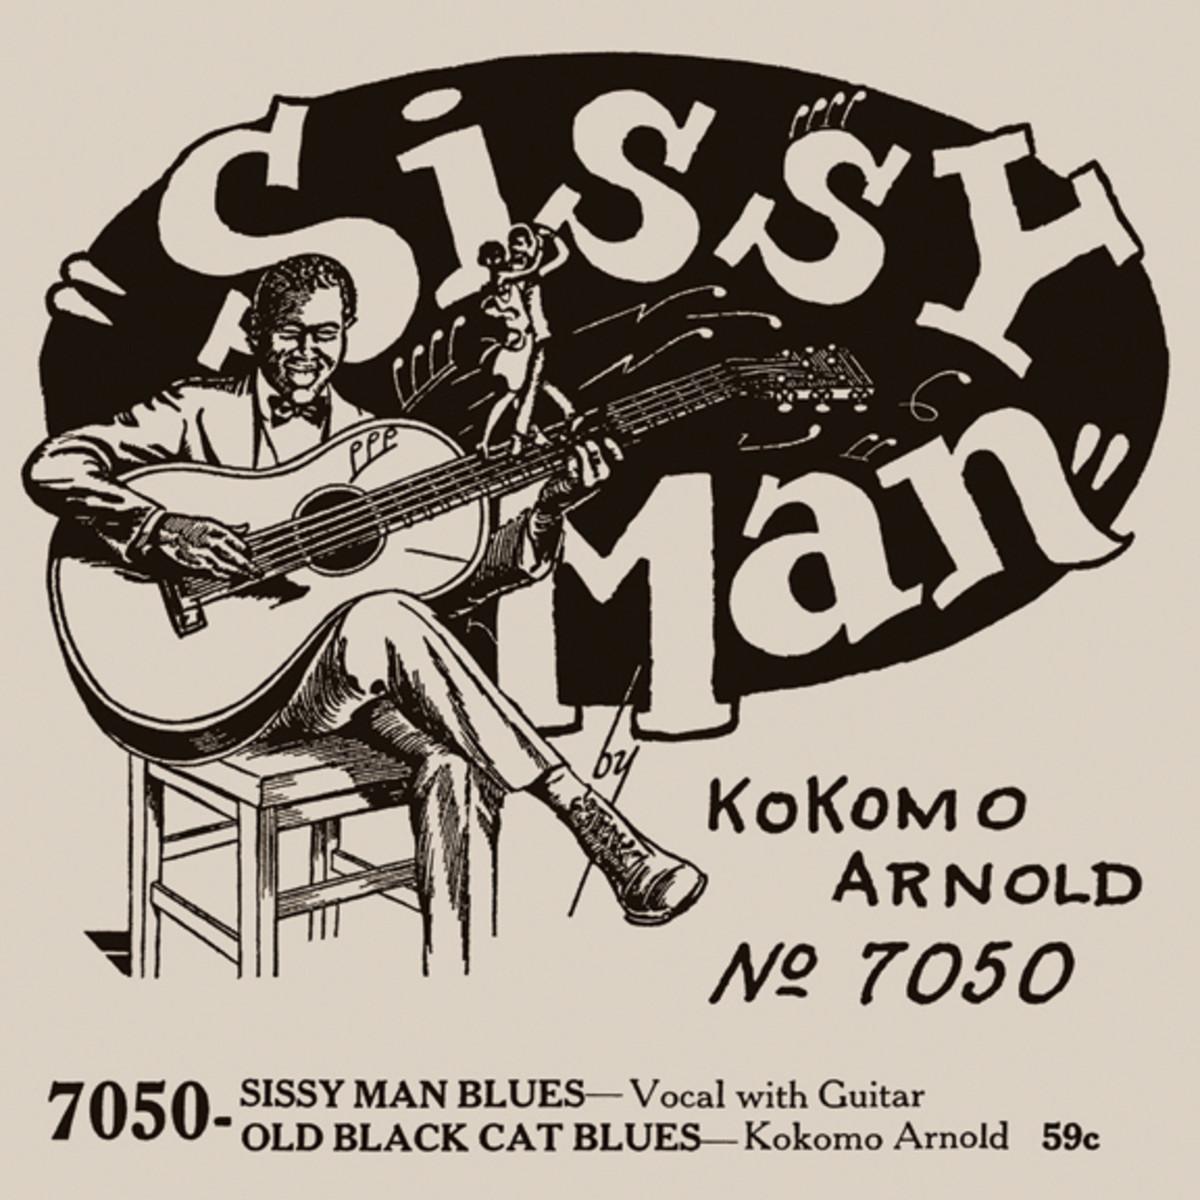 Kokomo Arnold Sissy Man Blues ad